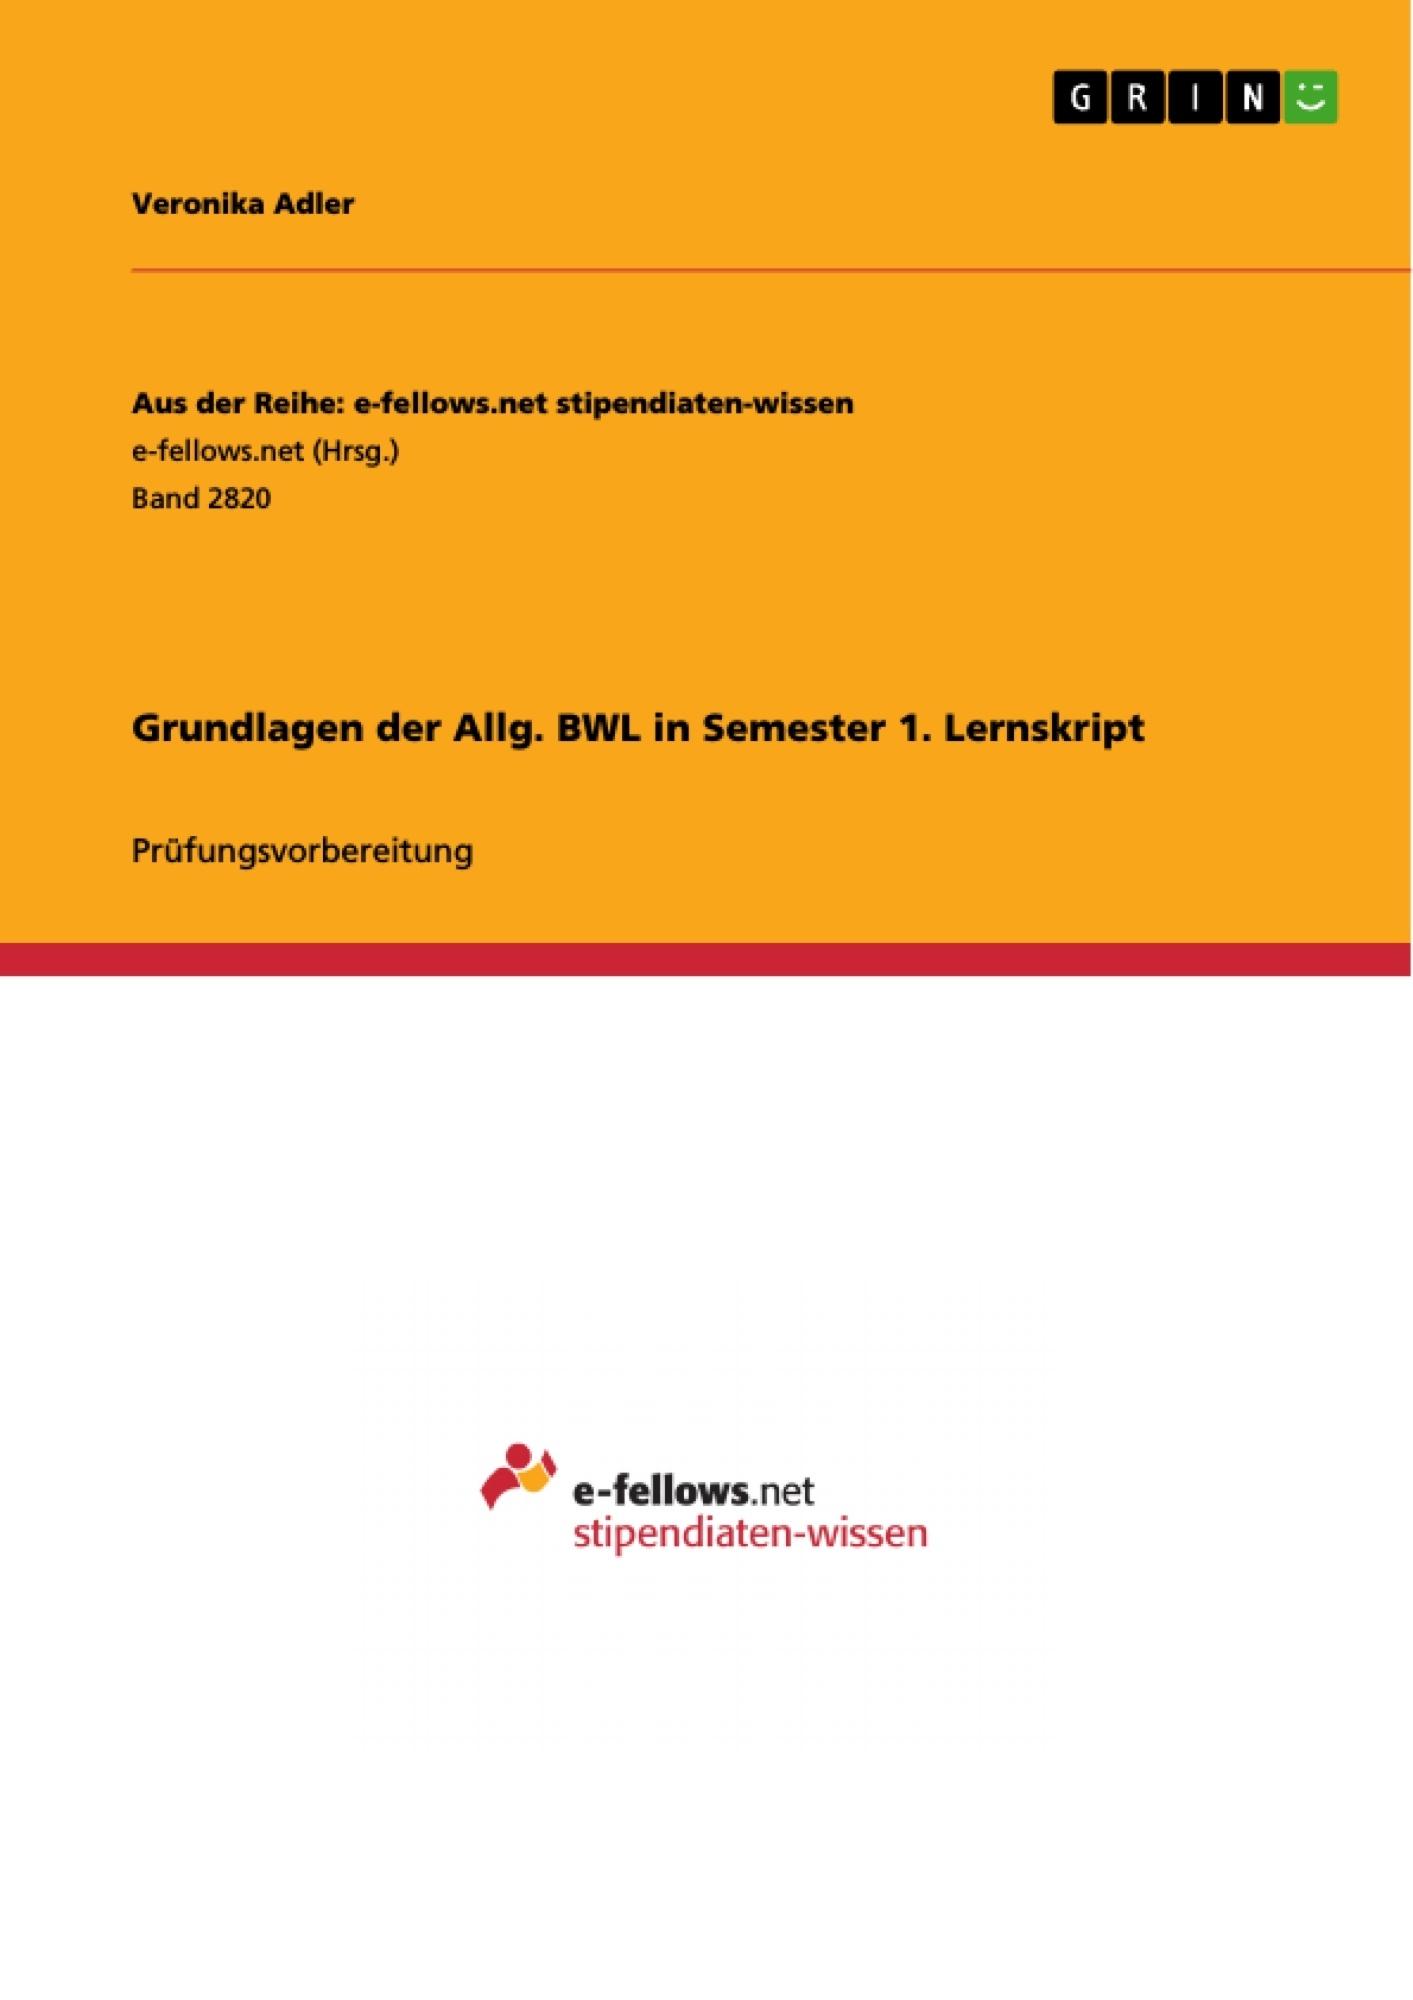 Titel: Grundlagen der Allg. BWL in Semester 1. Lernskript